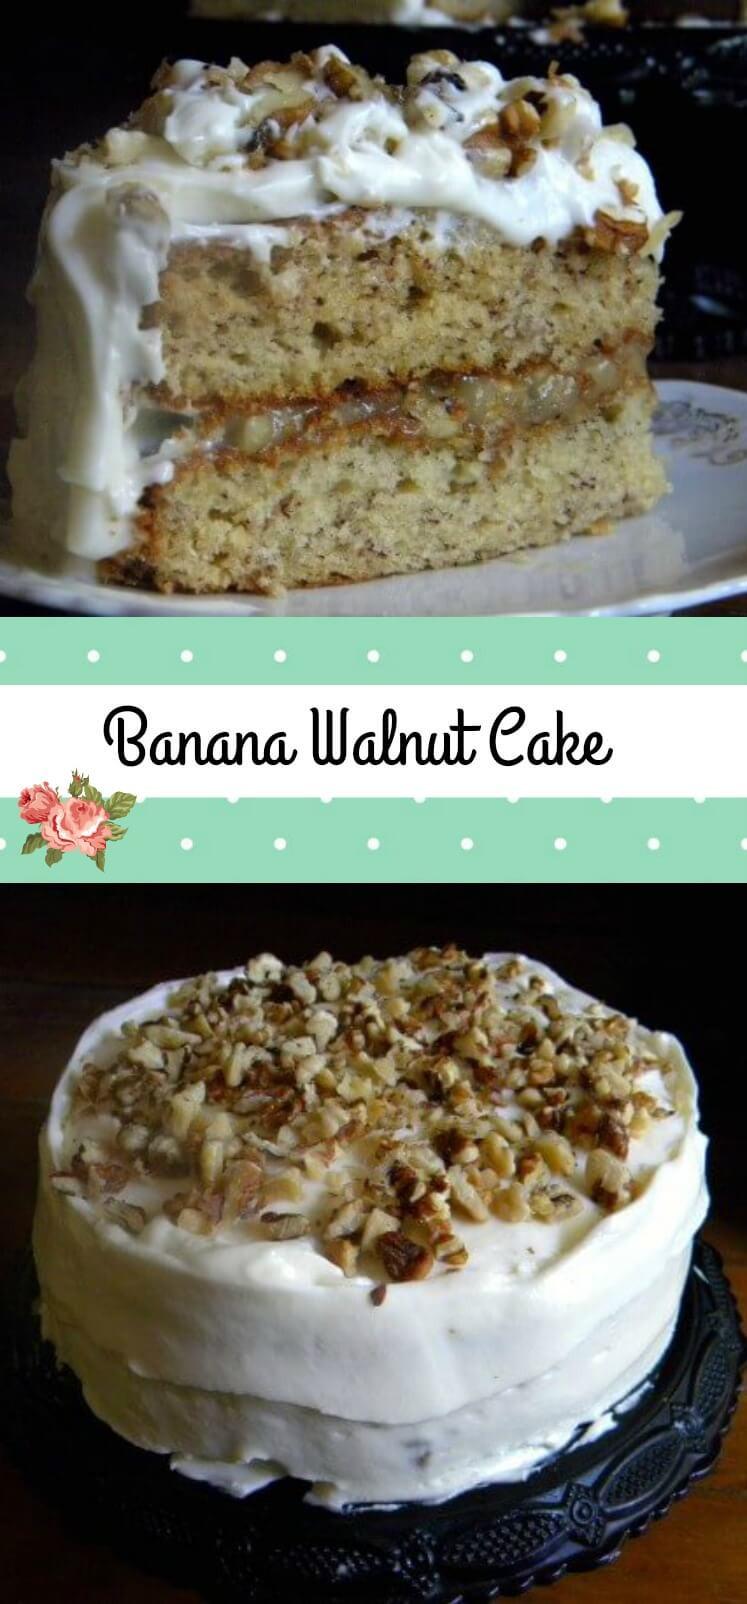 Banana Walnut Cake  Banana Walnut Cake with Cream Cheese Frosting